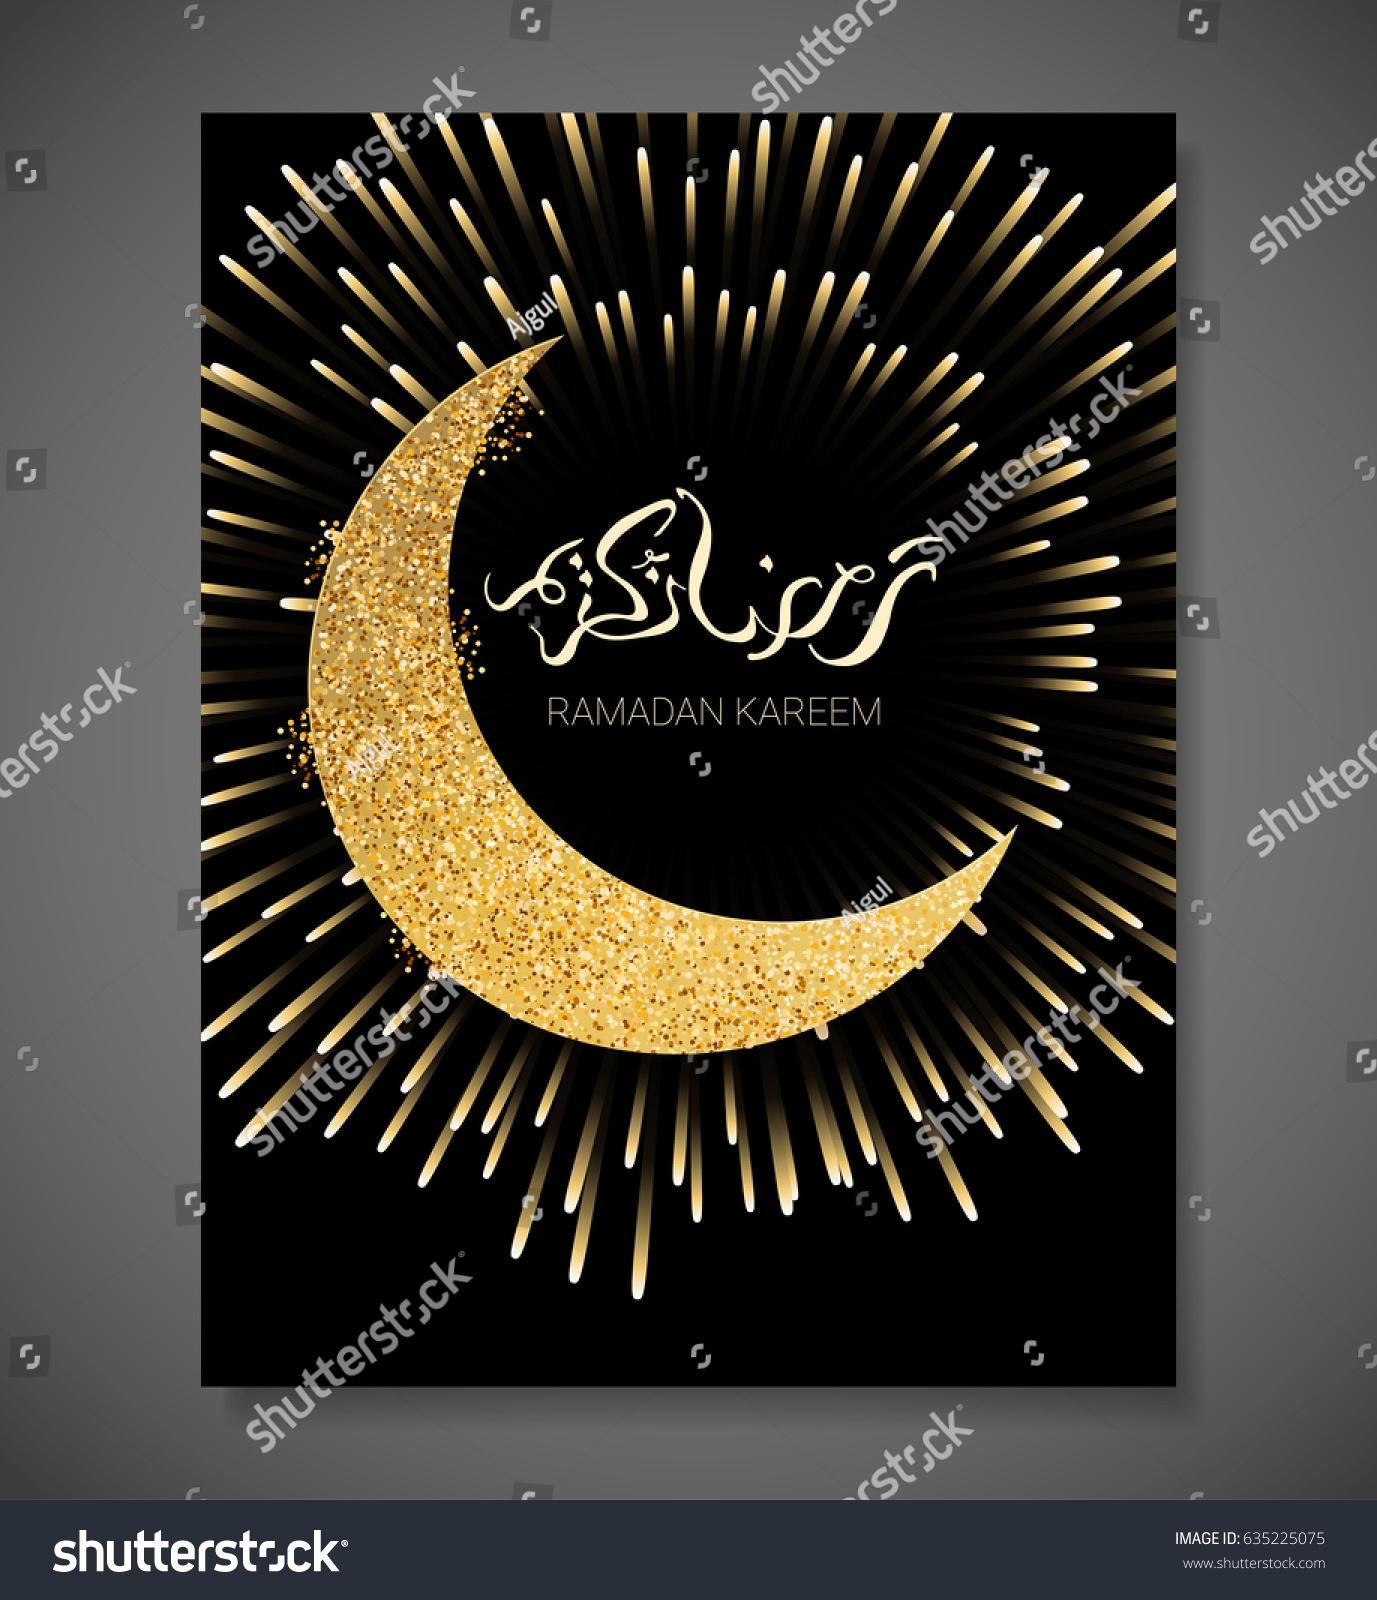 Ramadan kareem illustration golden paper moon stock vector 635225075 ramadan kareem illustration with golden paper moon vector design template for greetings card poster kristyandbryce Image collections